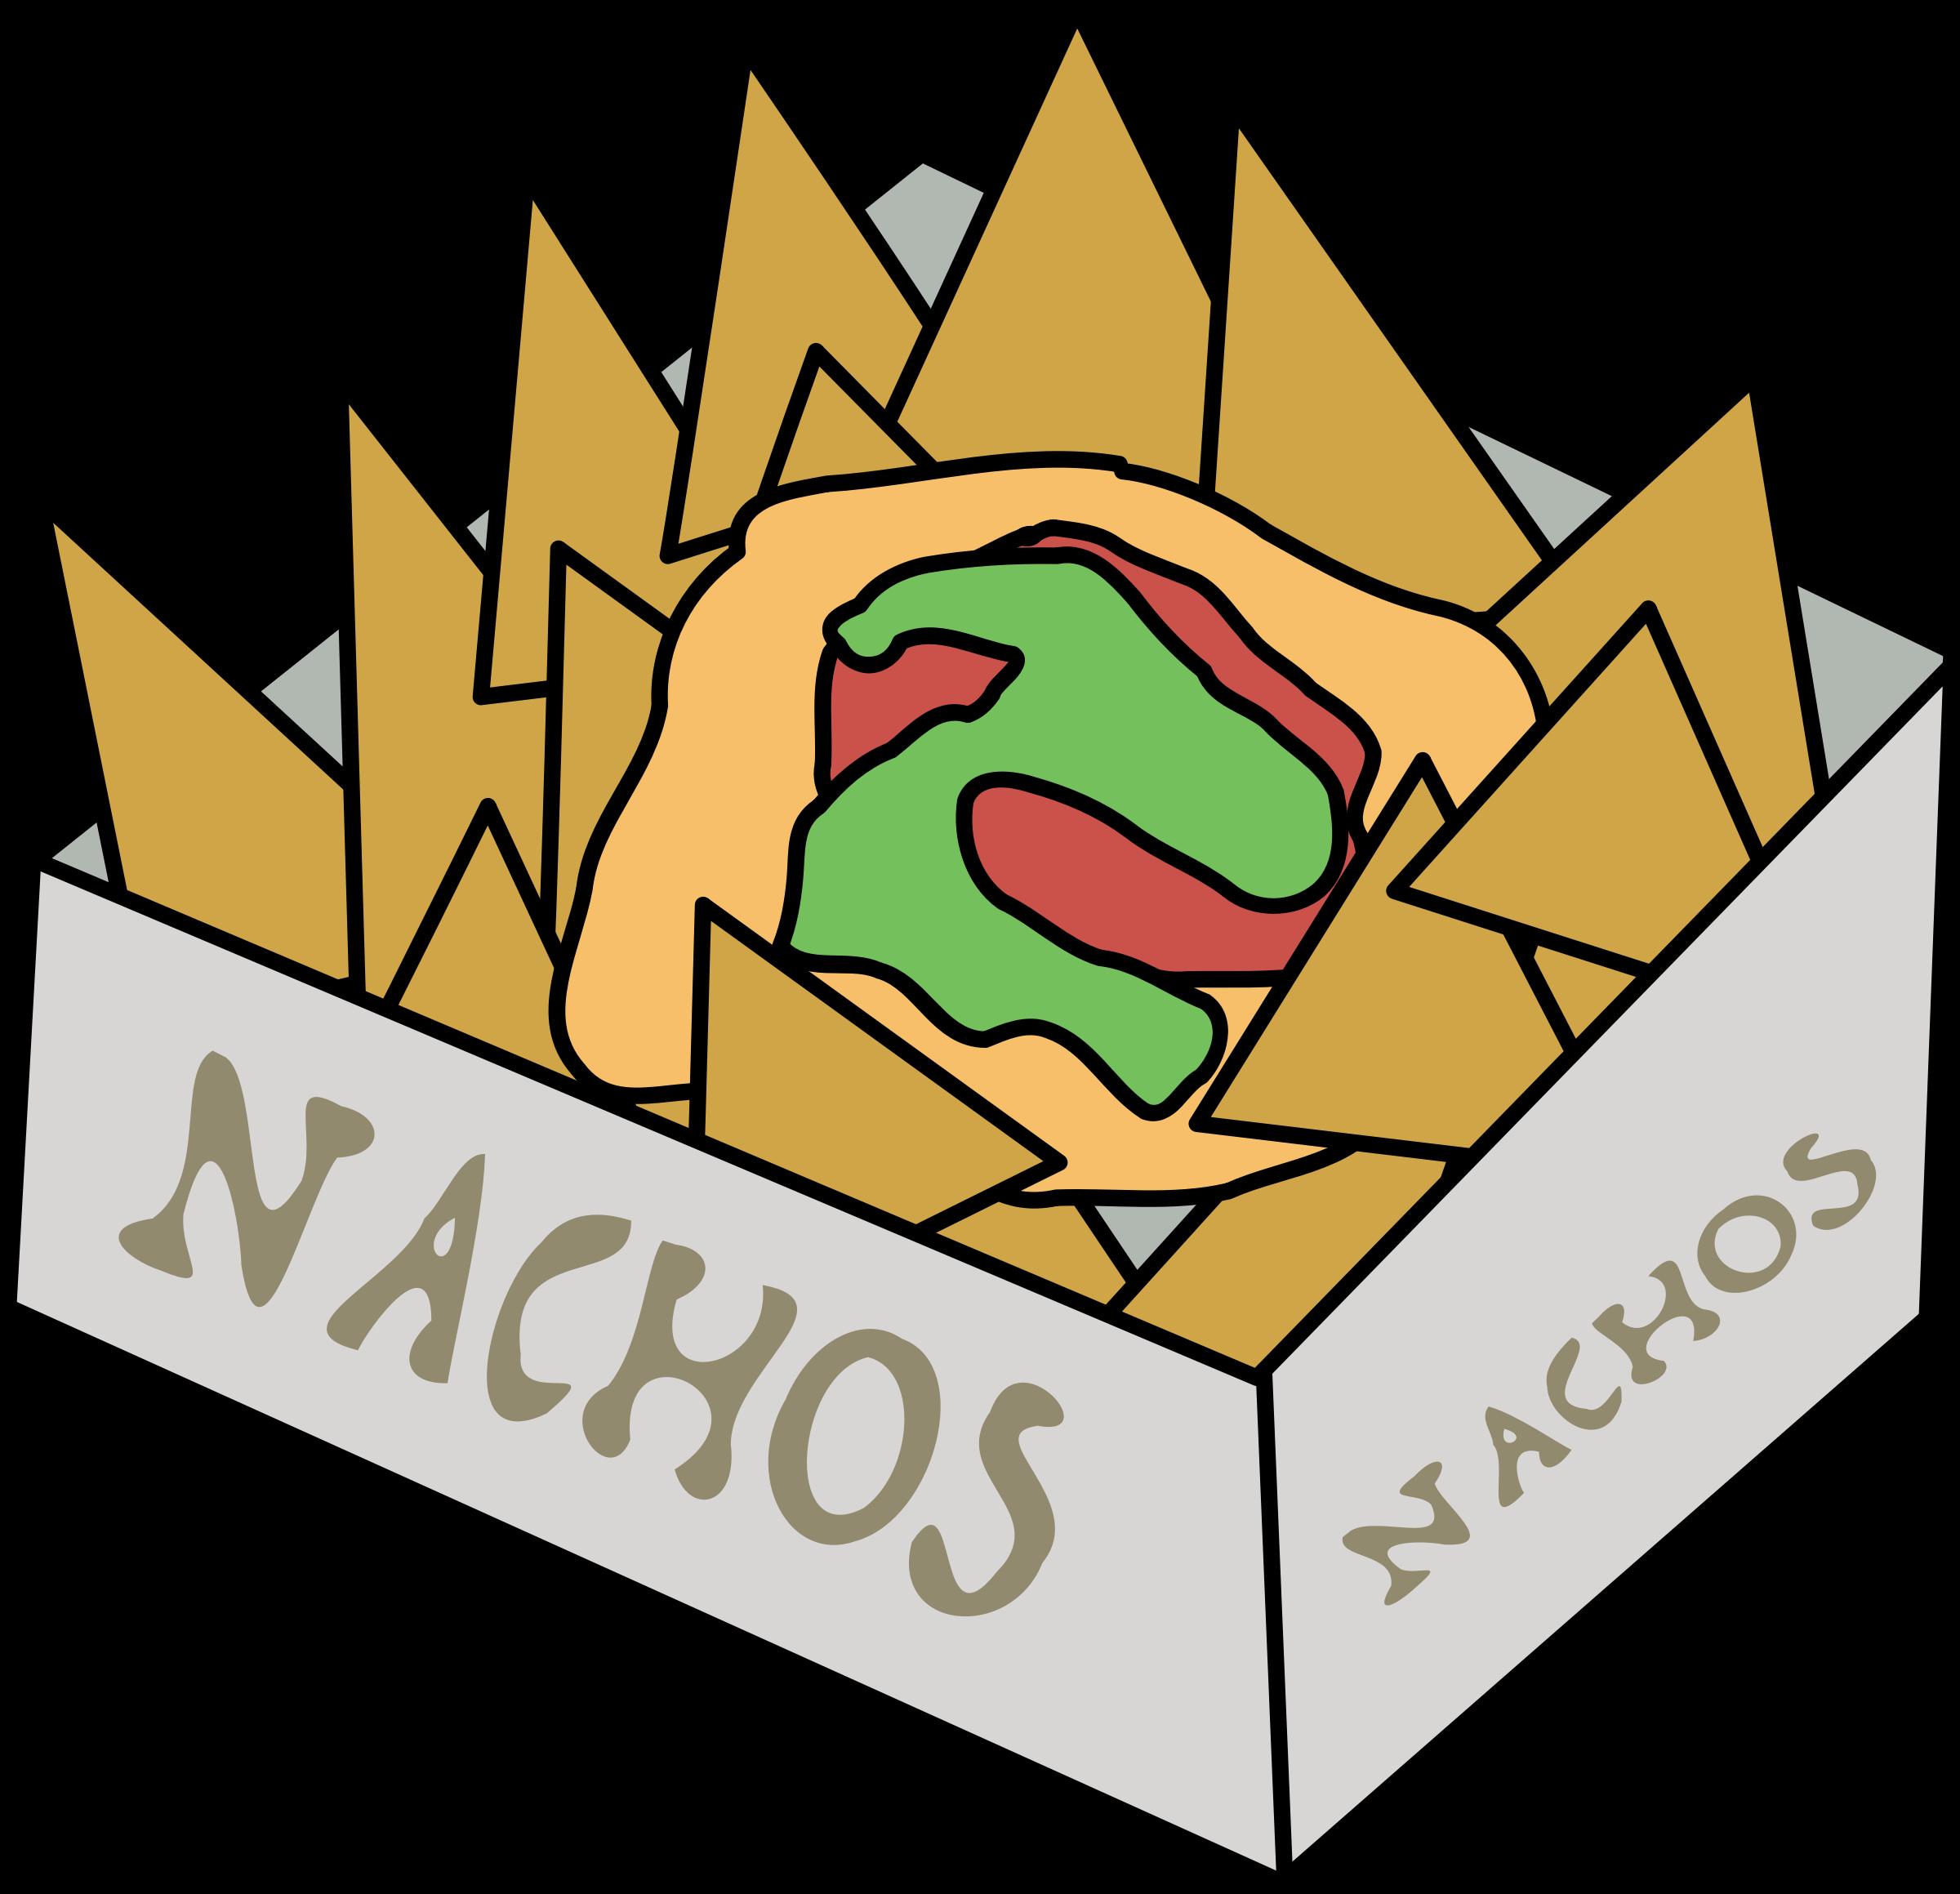 Big image png. Nachos clipart